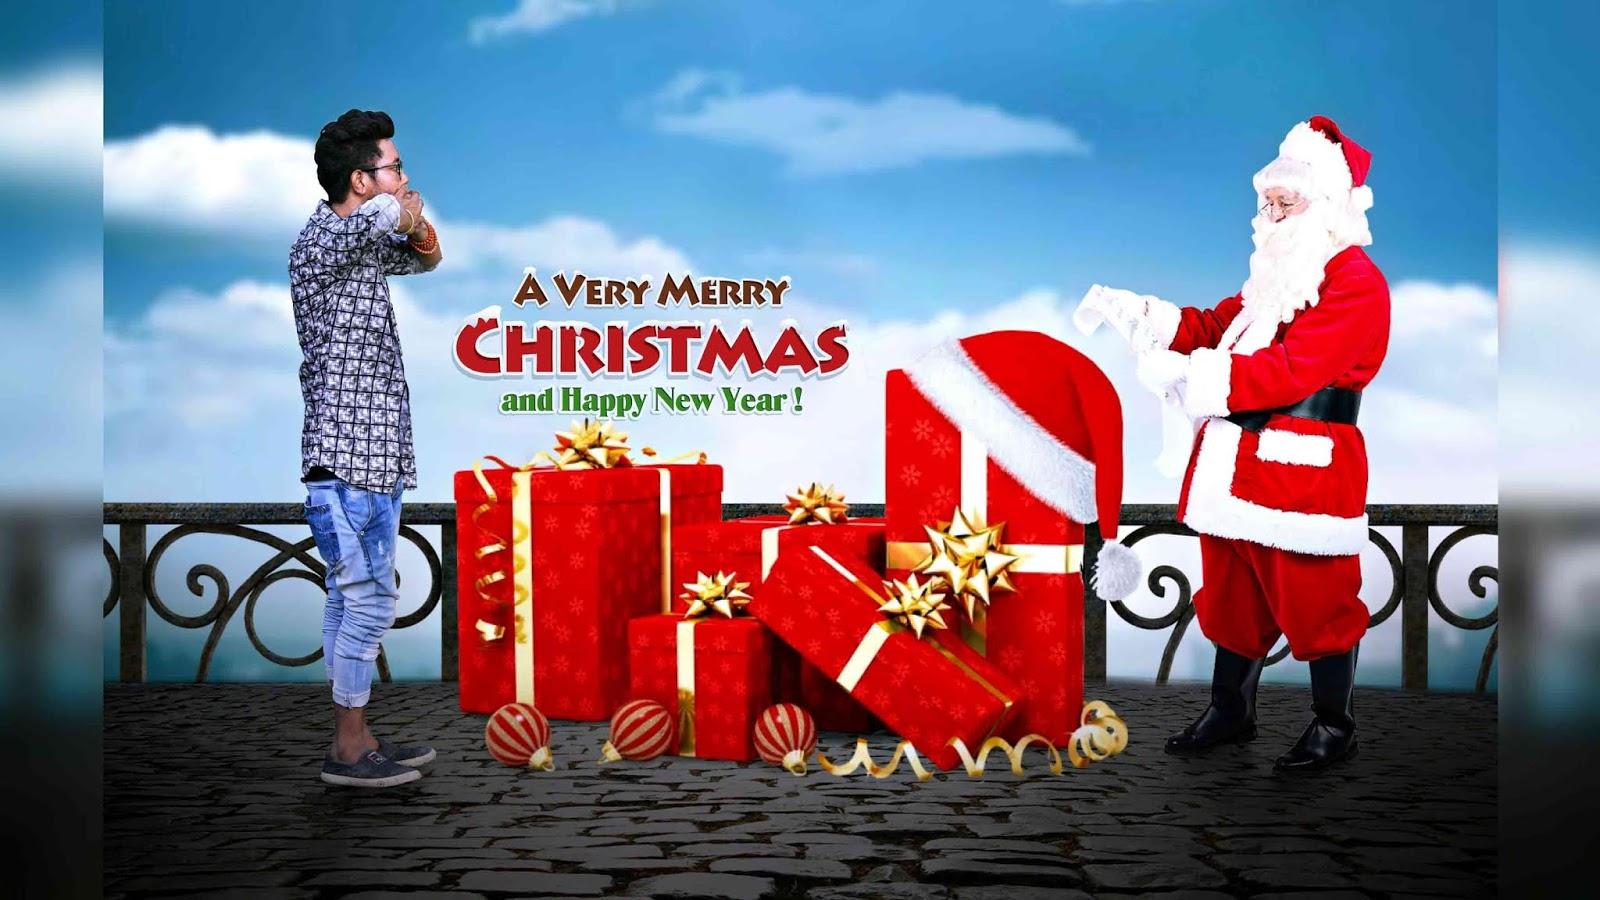 Christmas Background Picsart.Picsart Marry Christmas Editing Tutorial 25 December Special